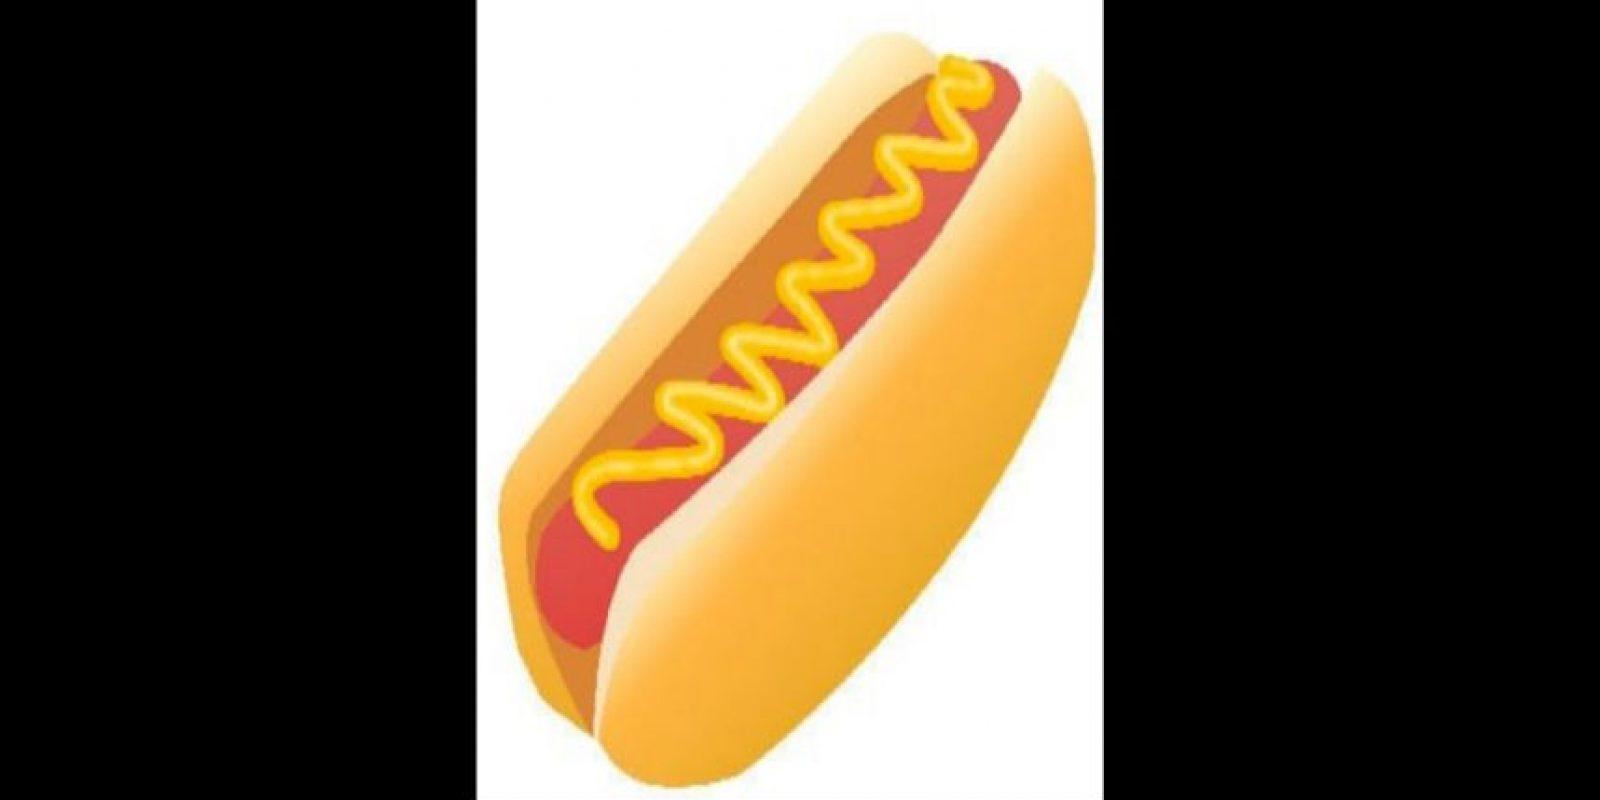 Hot-Dog Foto:Emojipedia